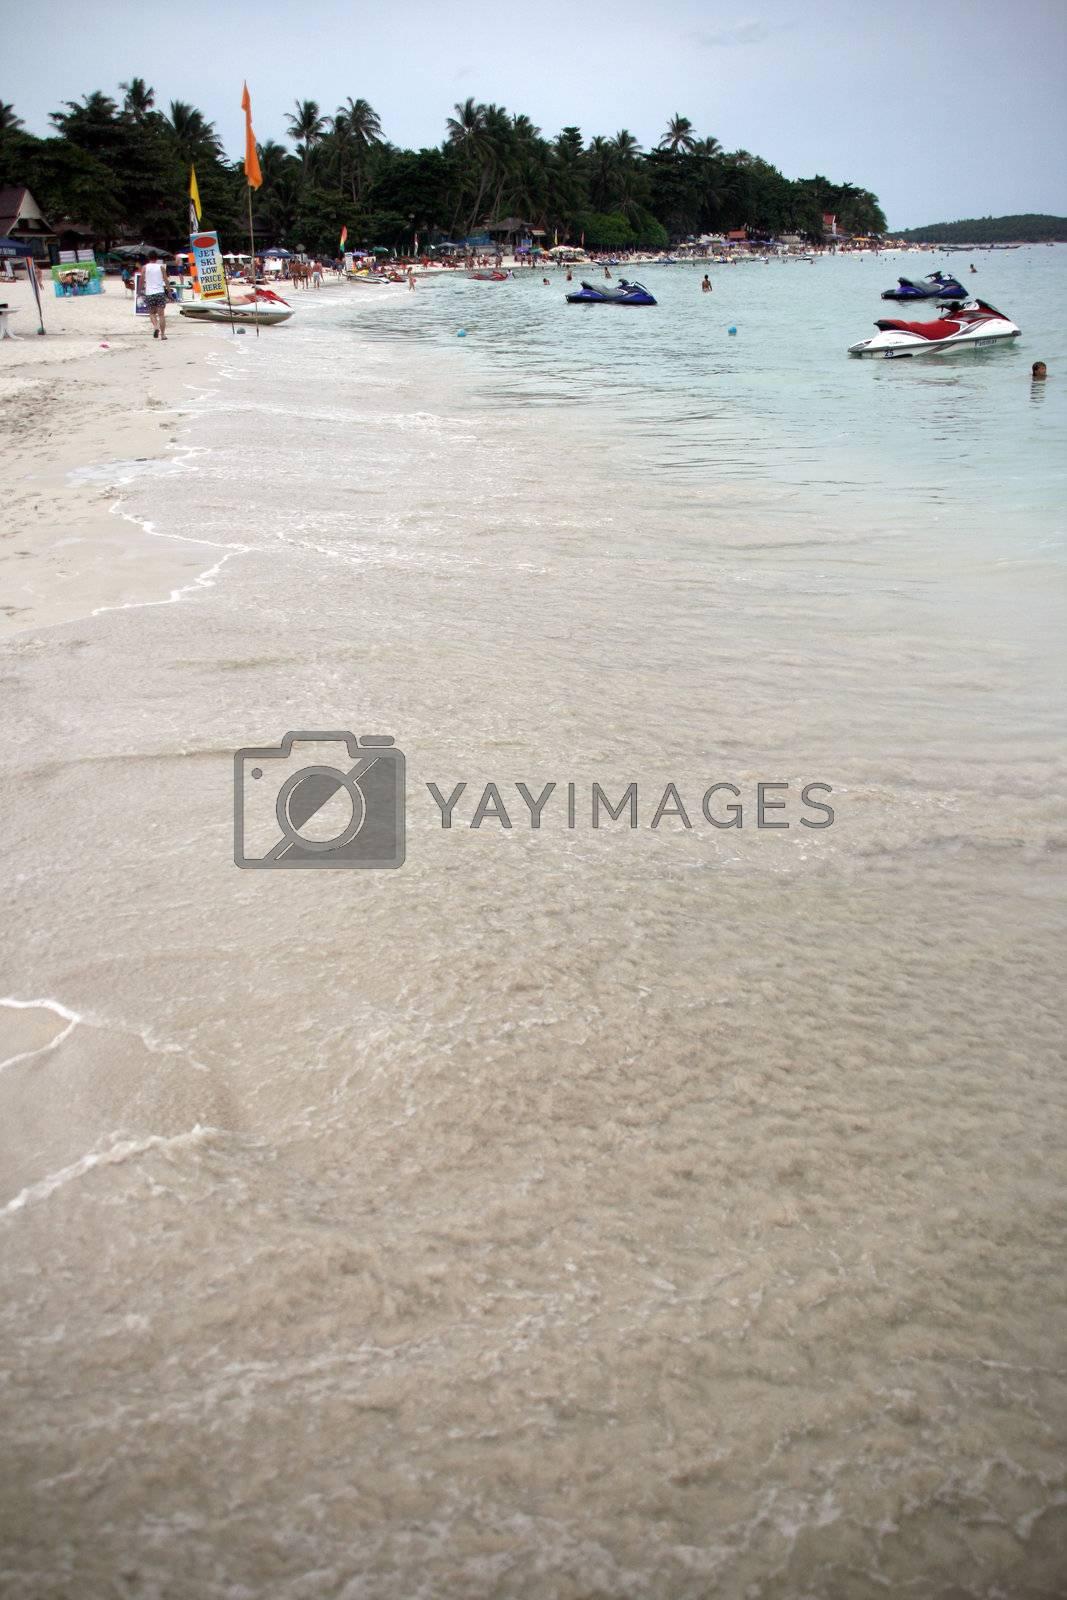 Royalty free image of sea shore by forwardcom